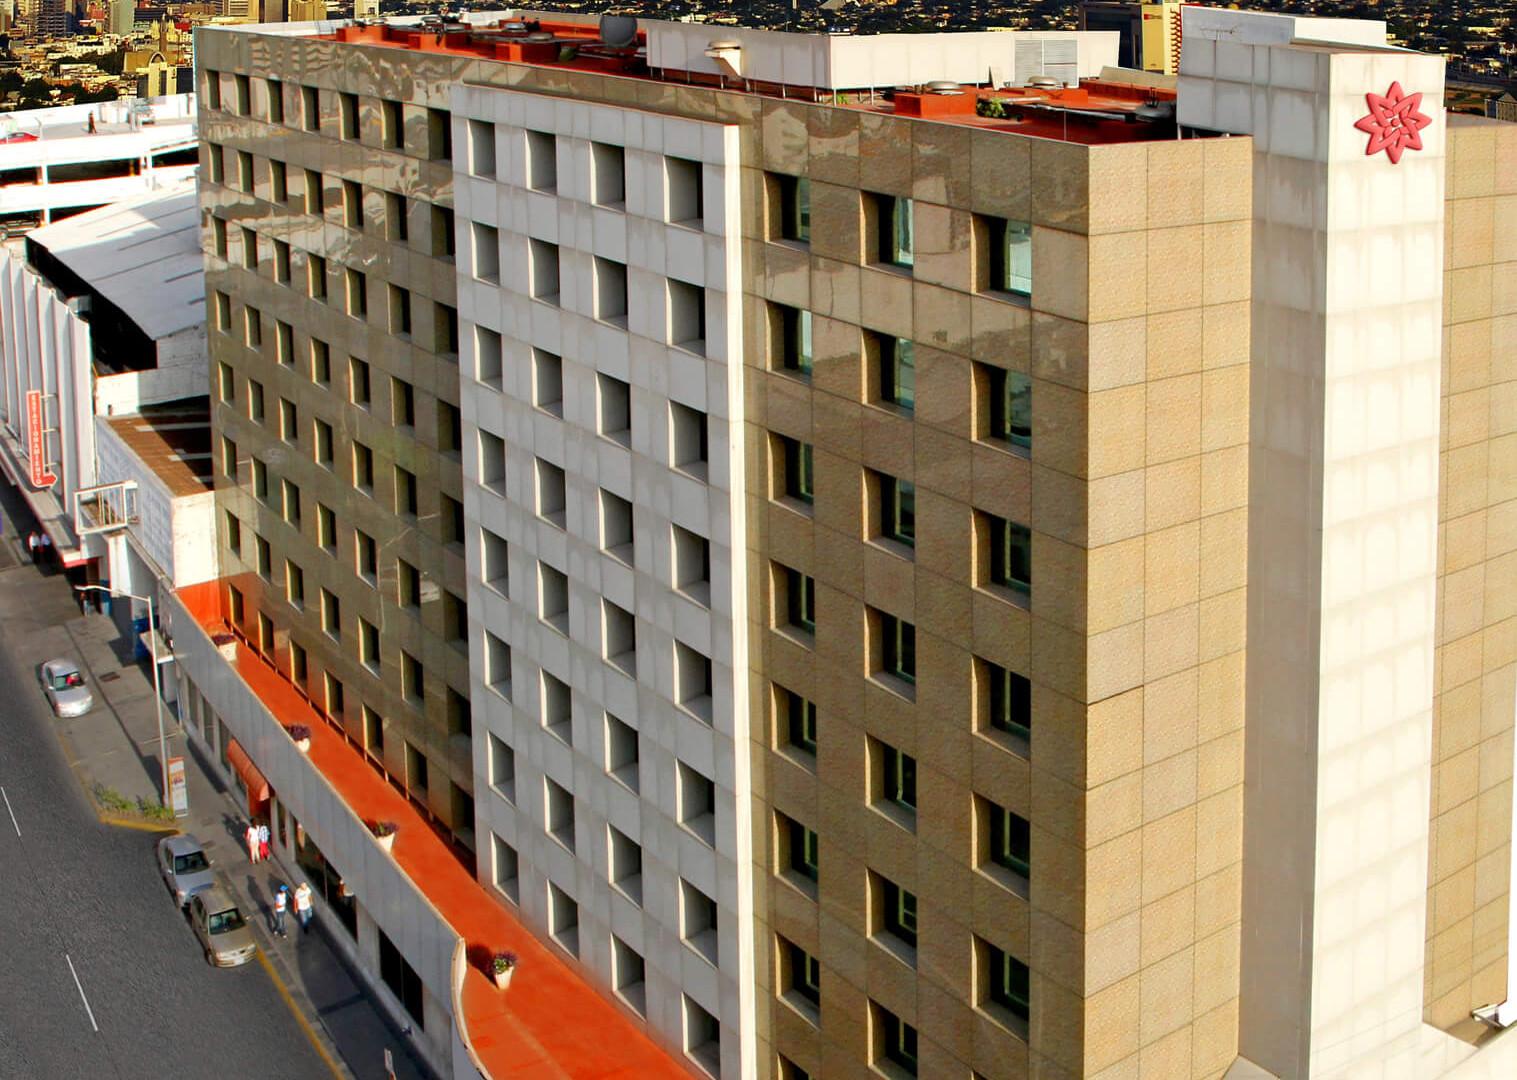 FAchada Hotel Travohotel Monterrey centro historico